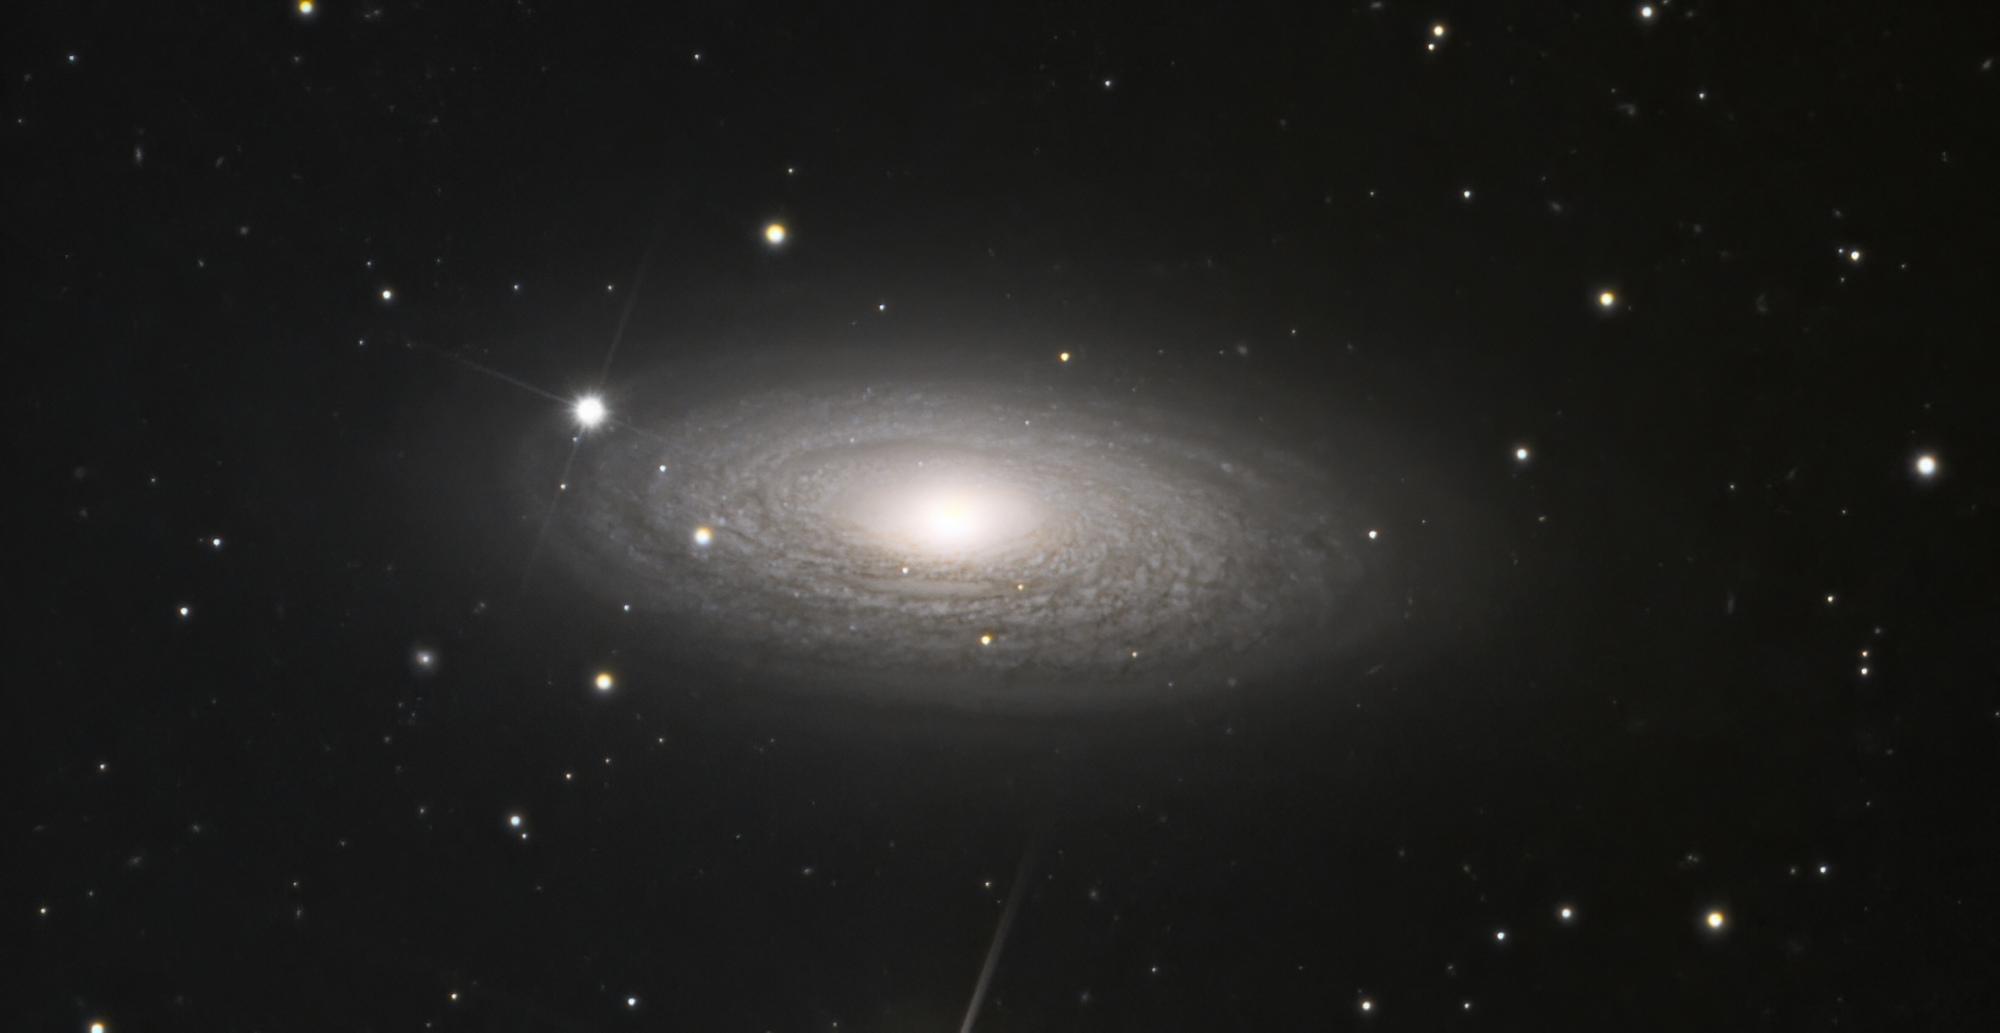 NGC2841-denoise-low-light.thumb.jpeg.7386ed1f212f016282290e0aee9bf24a.jpeg